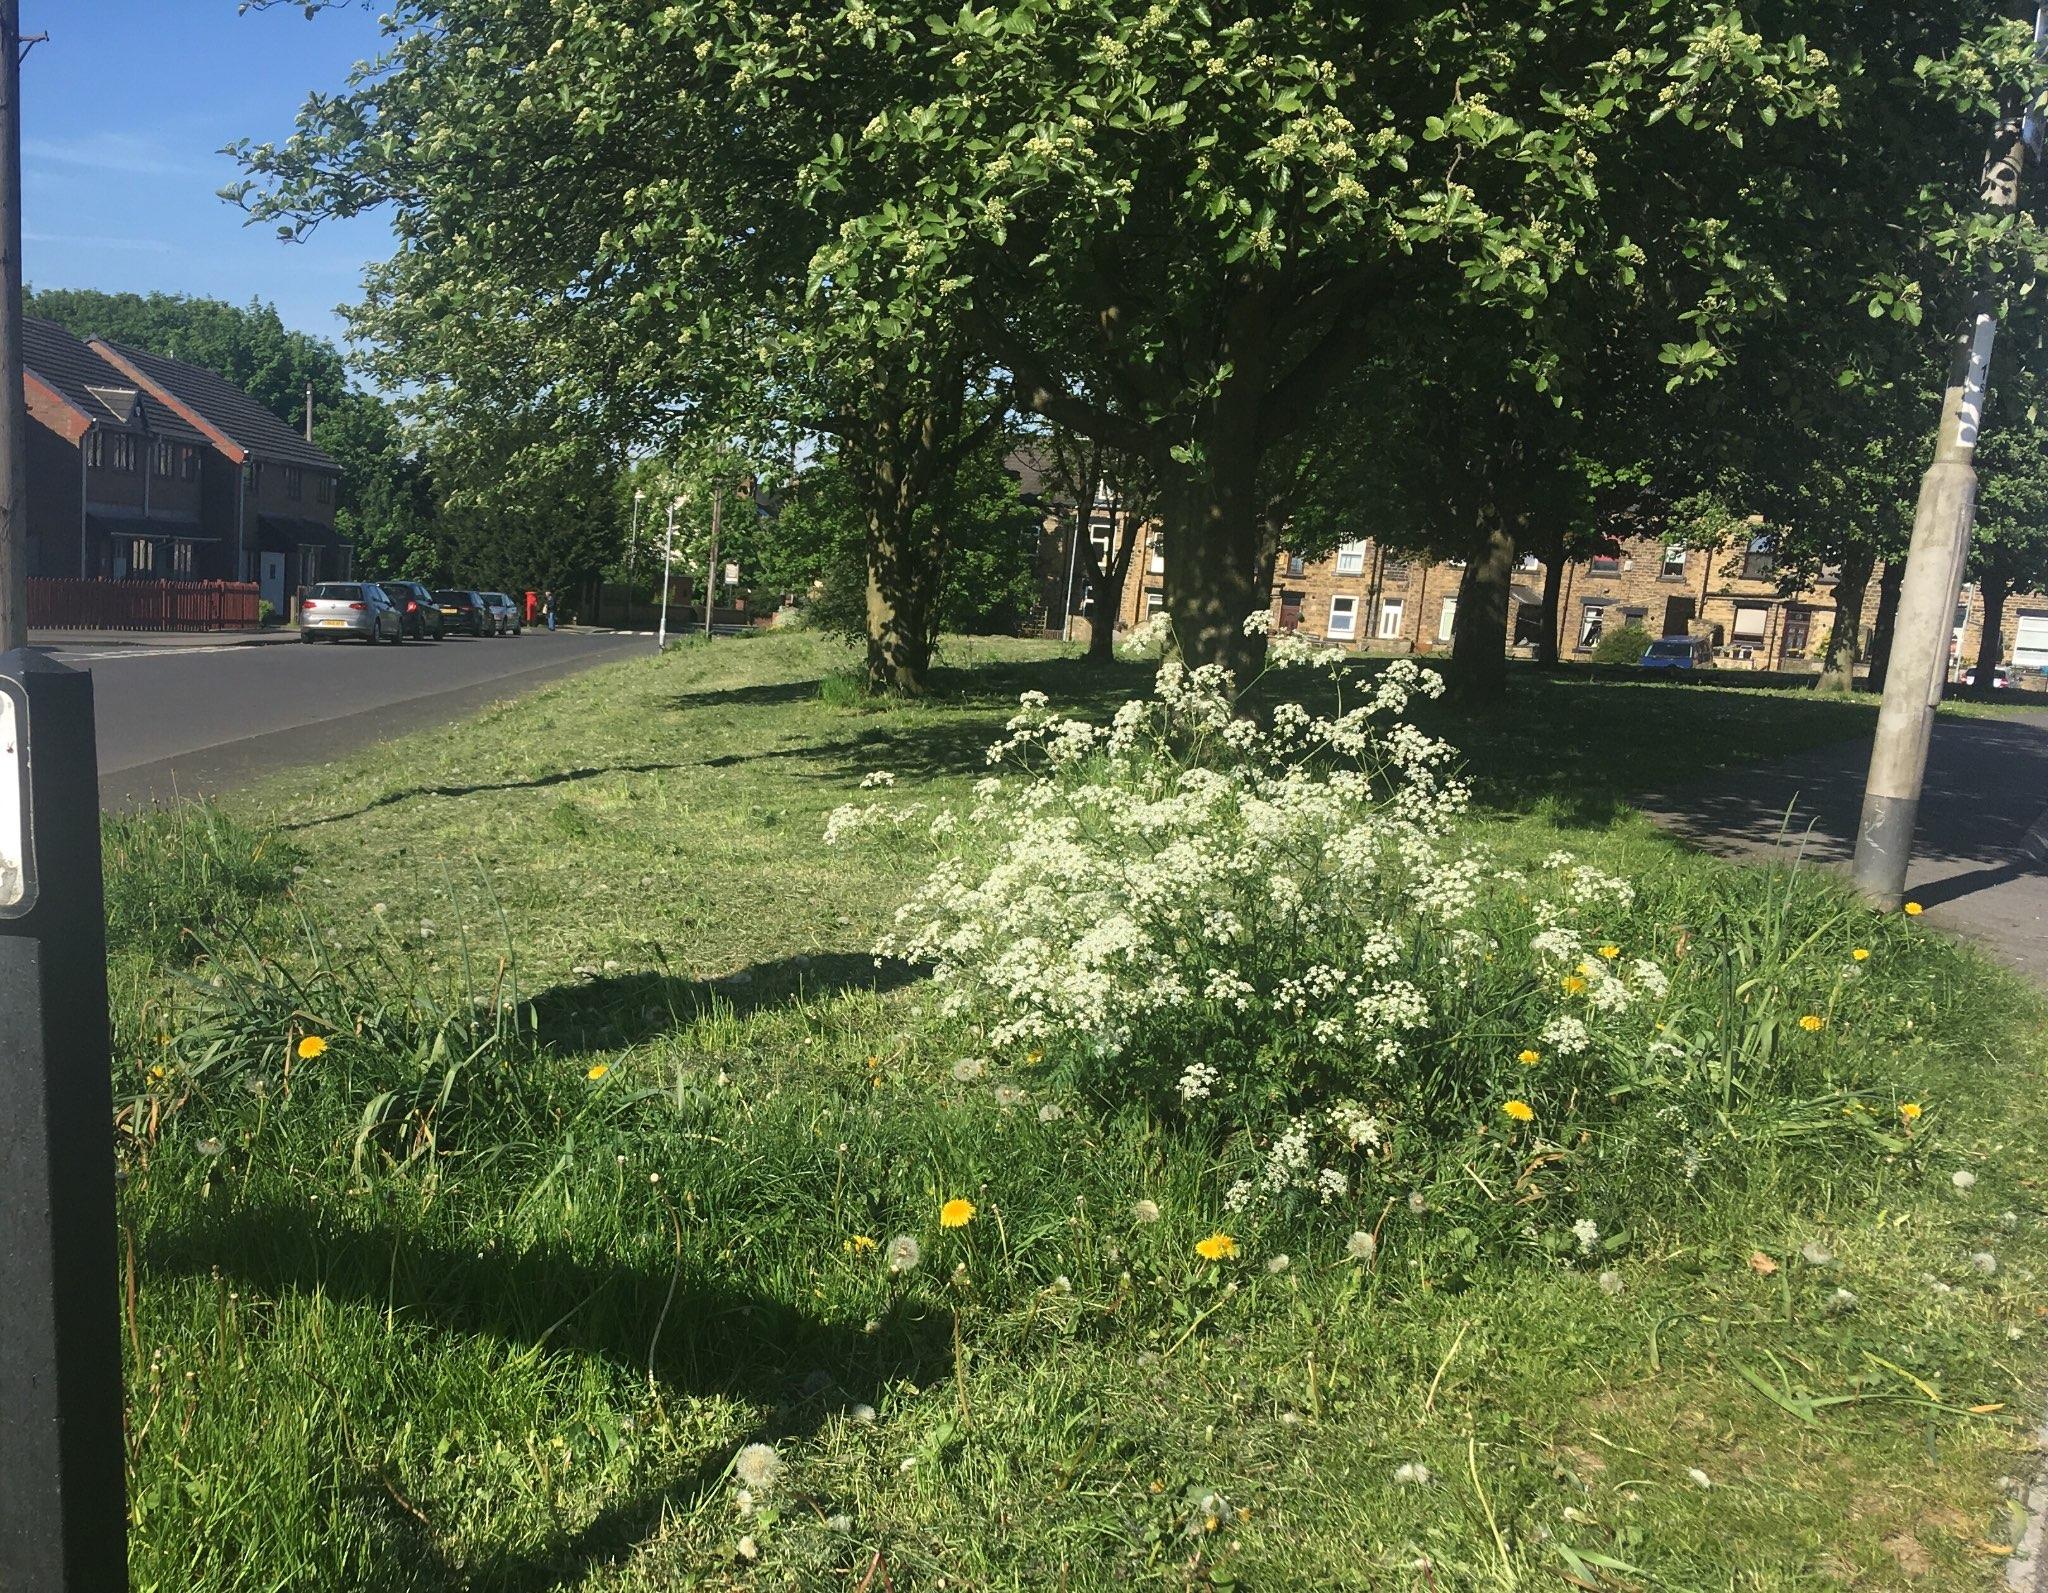 bramley grass cutting